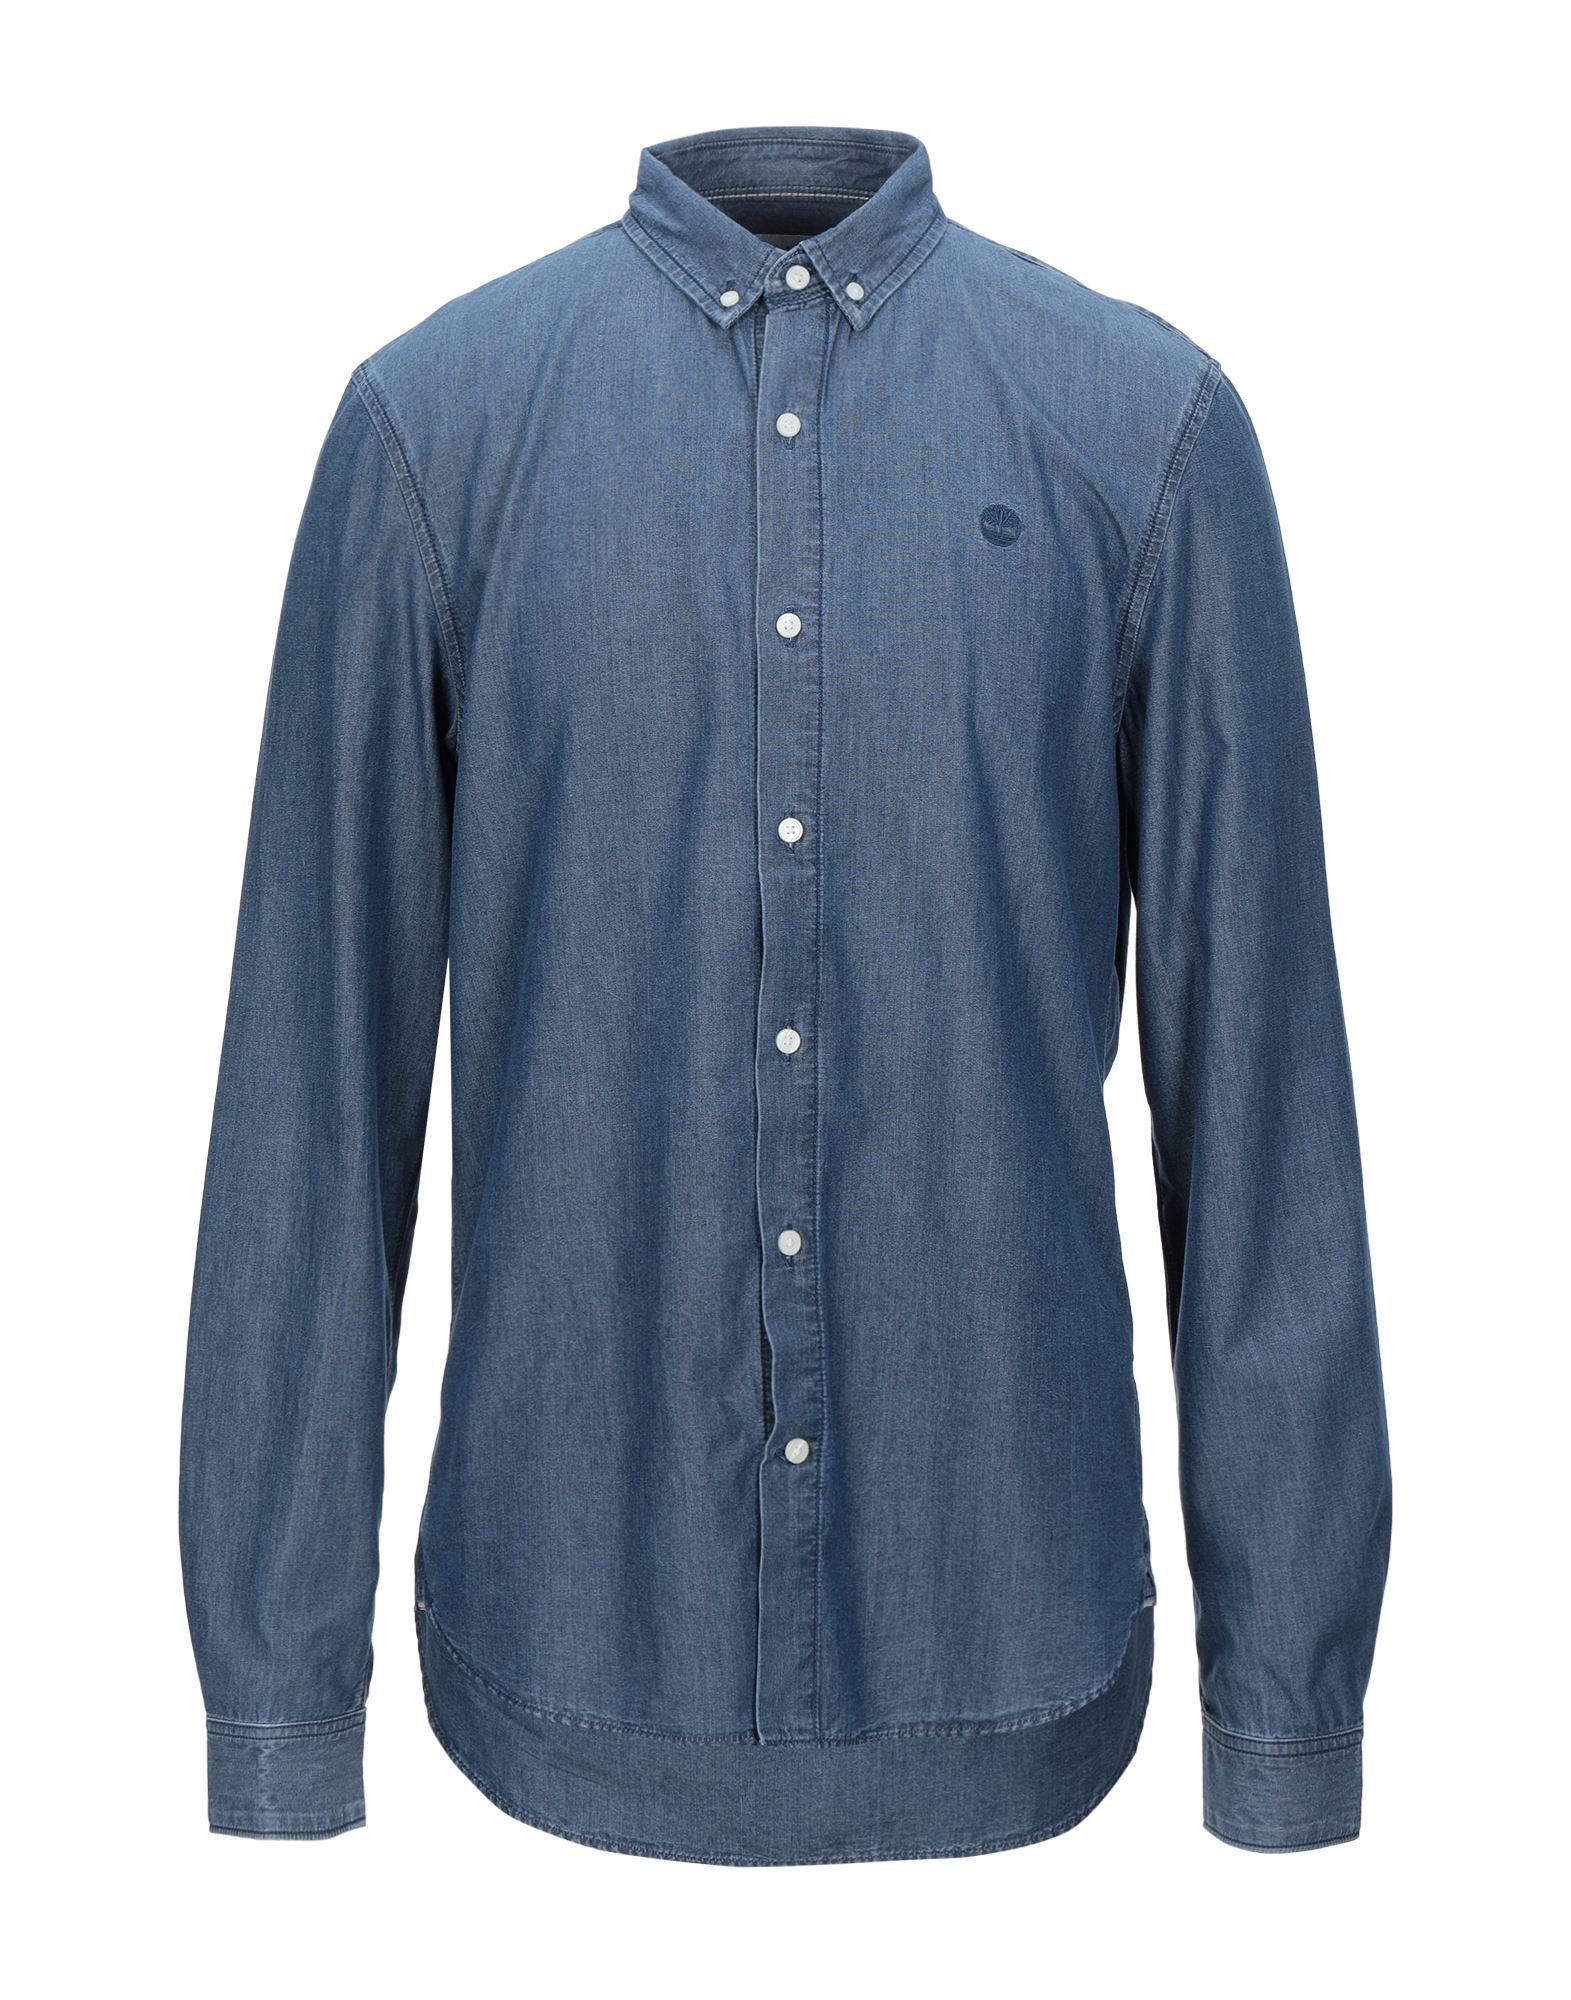 TIMBERLAND Denim shirts - Item 42815021